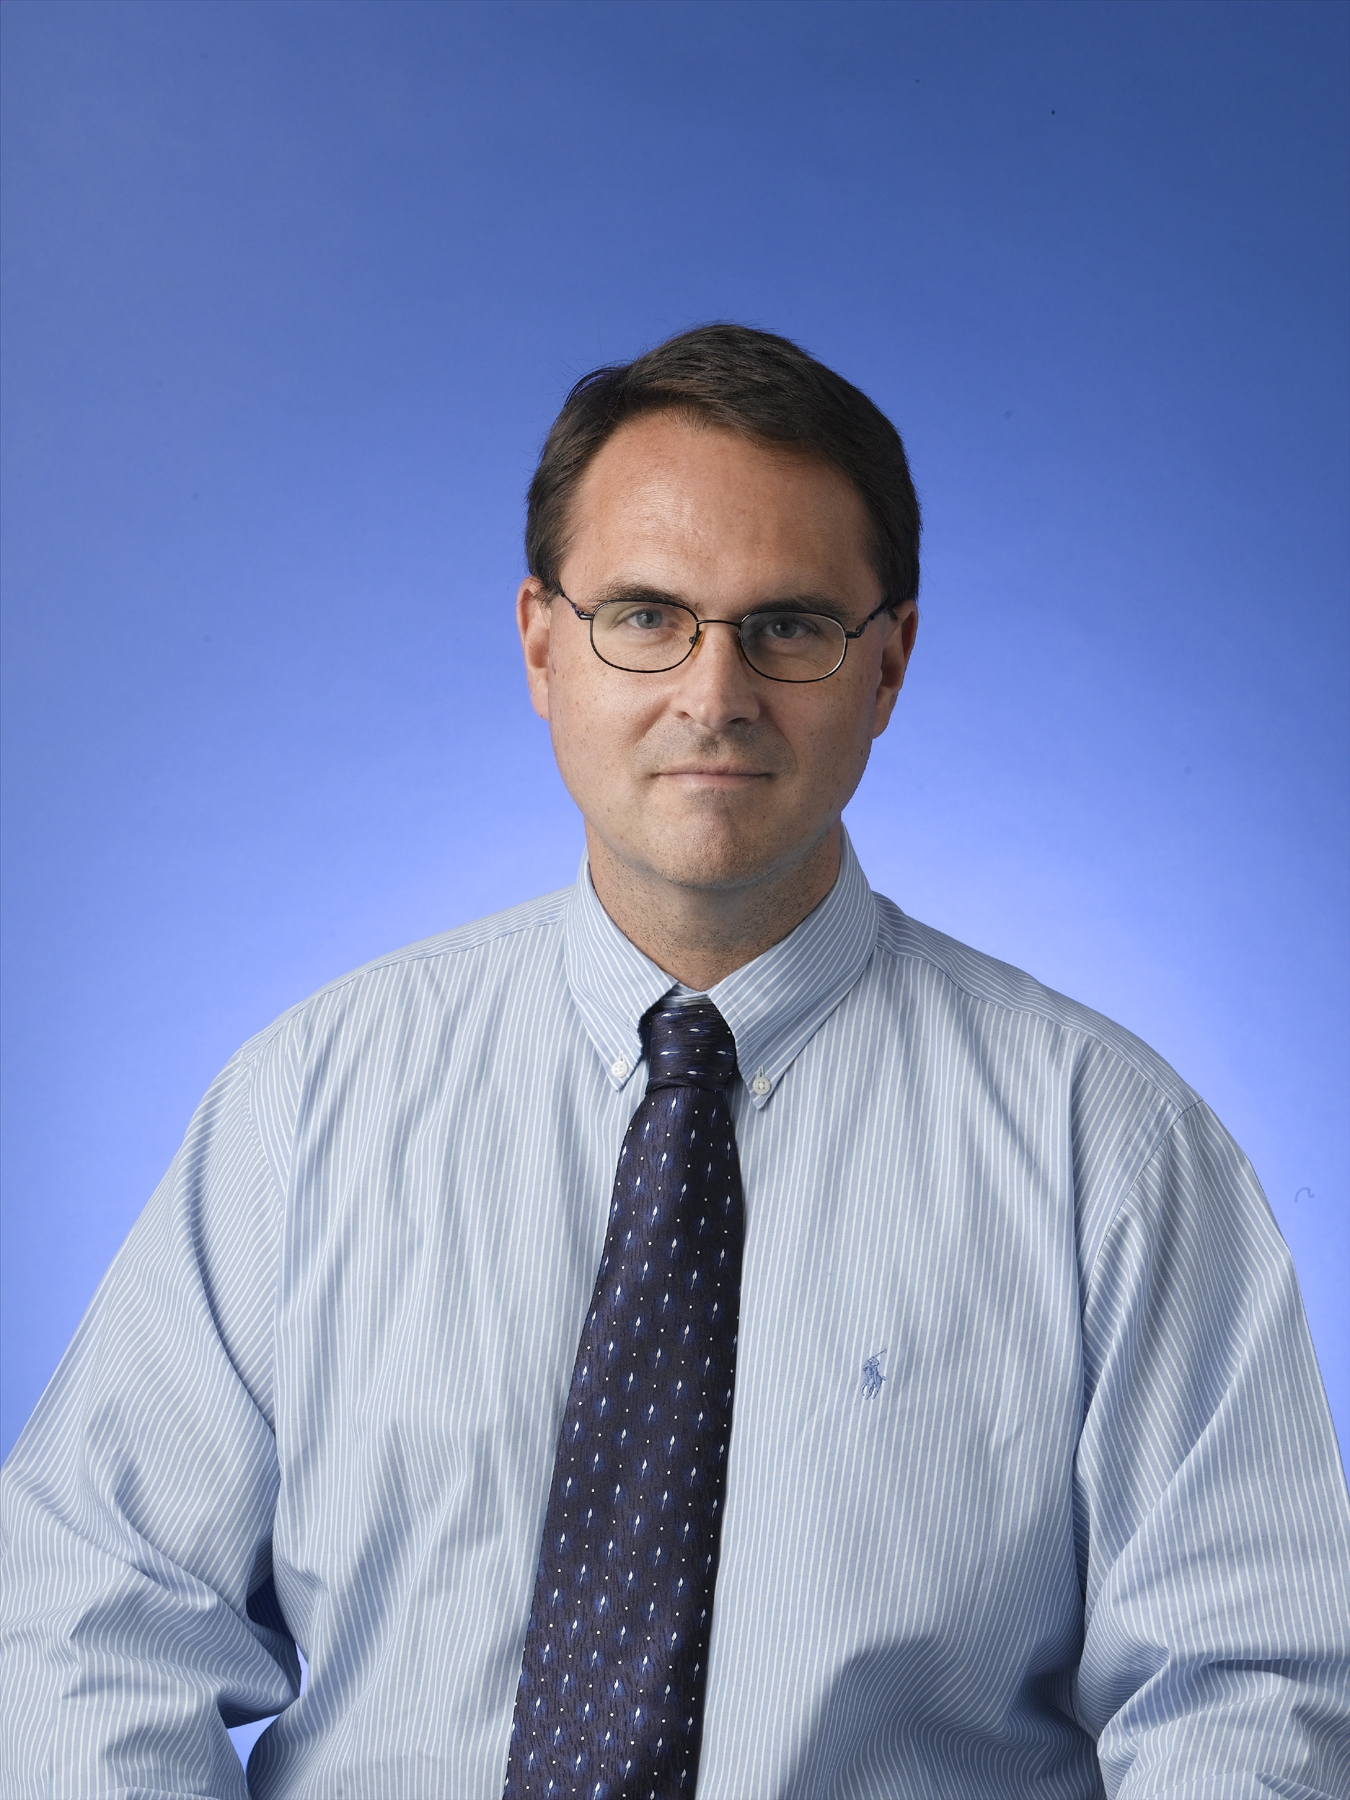 Prof. David Ahlstrom